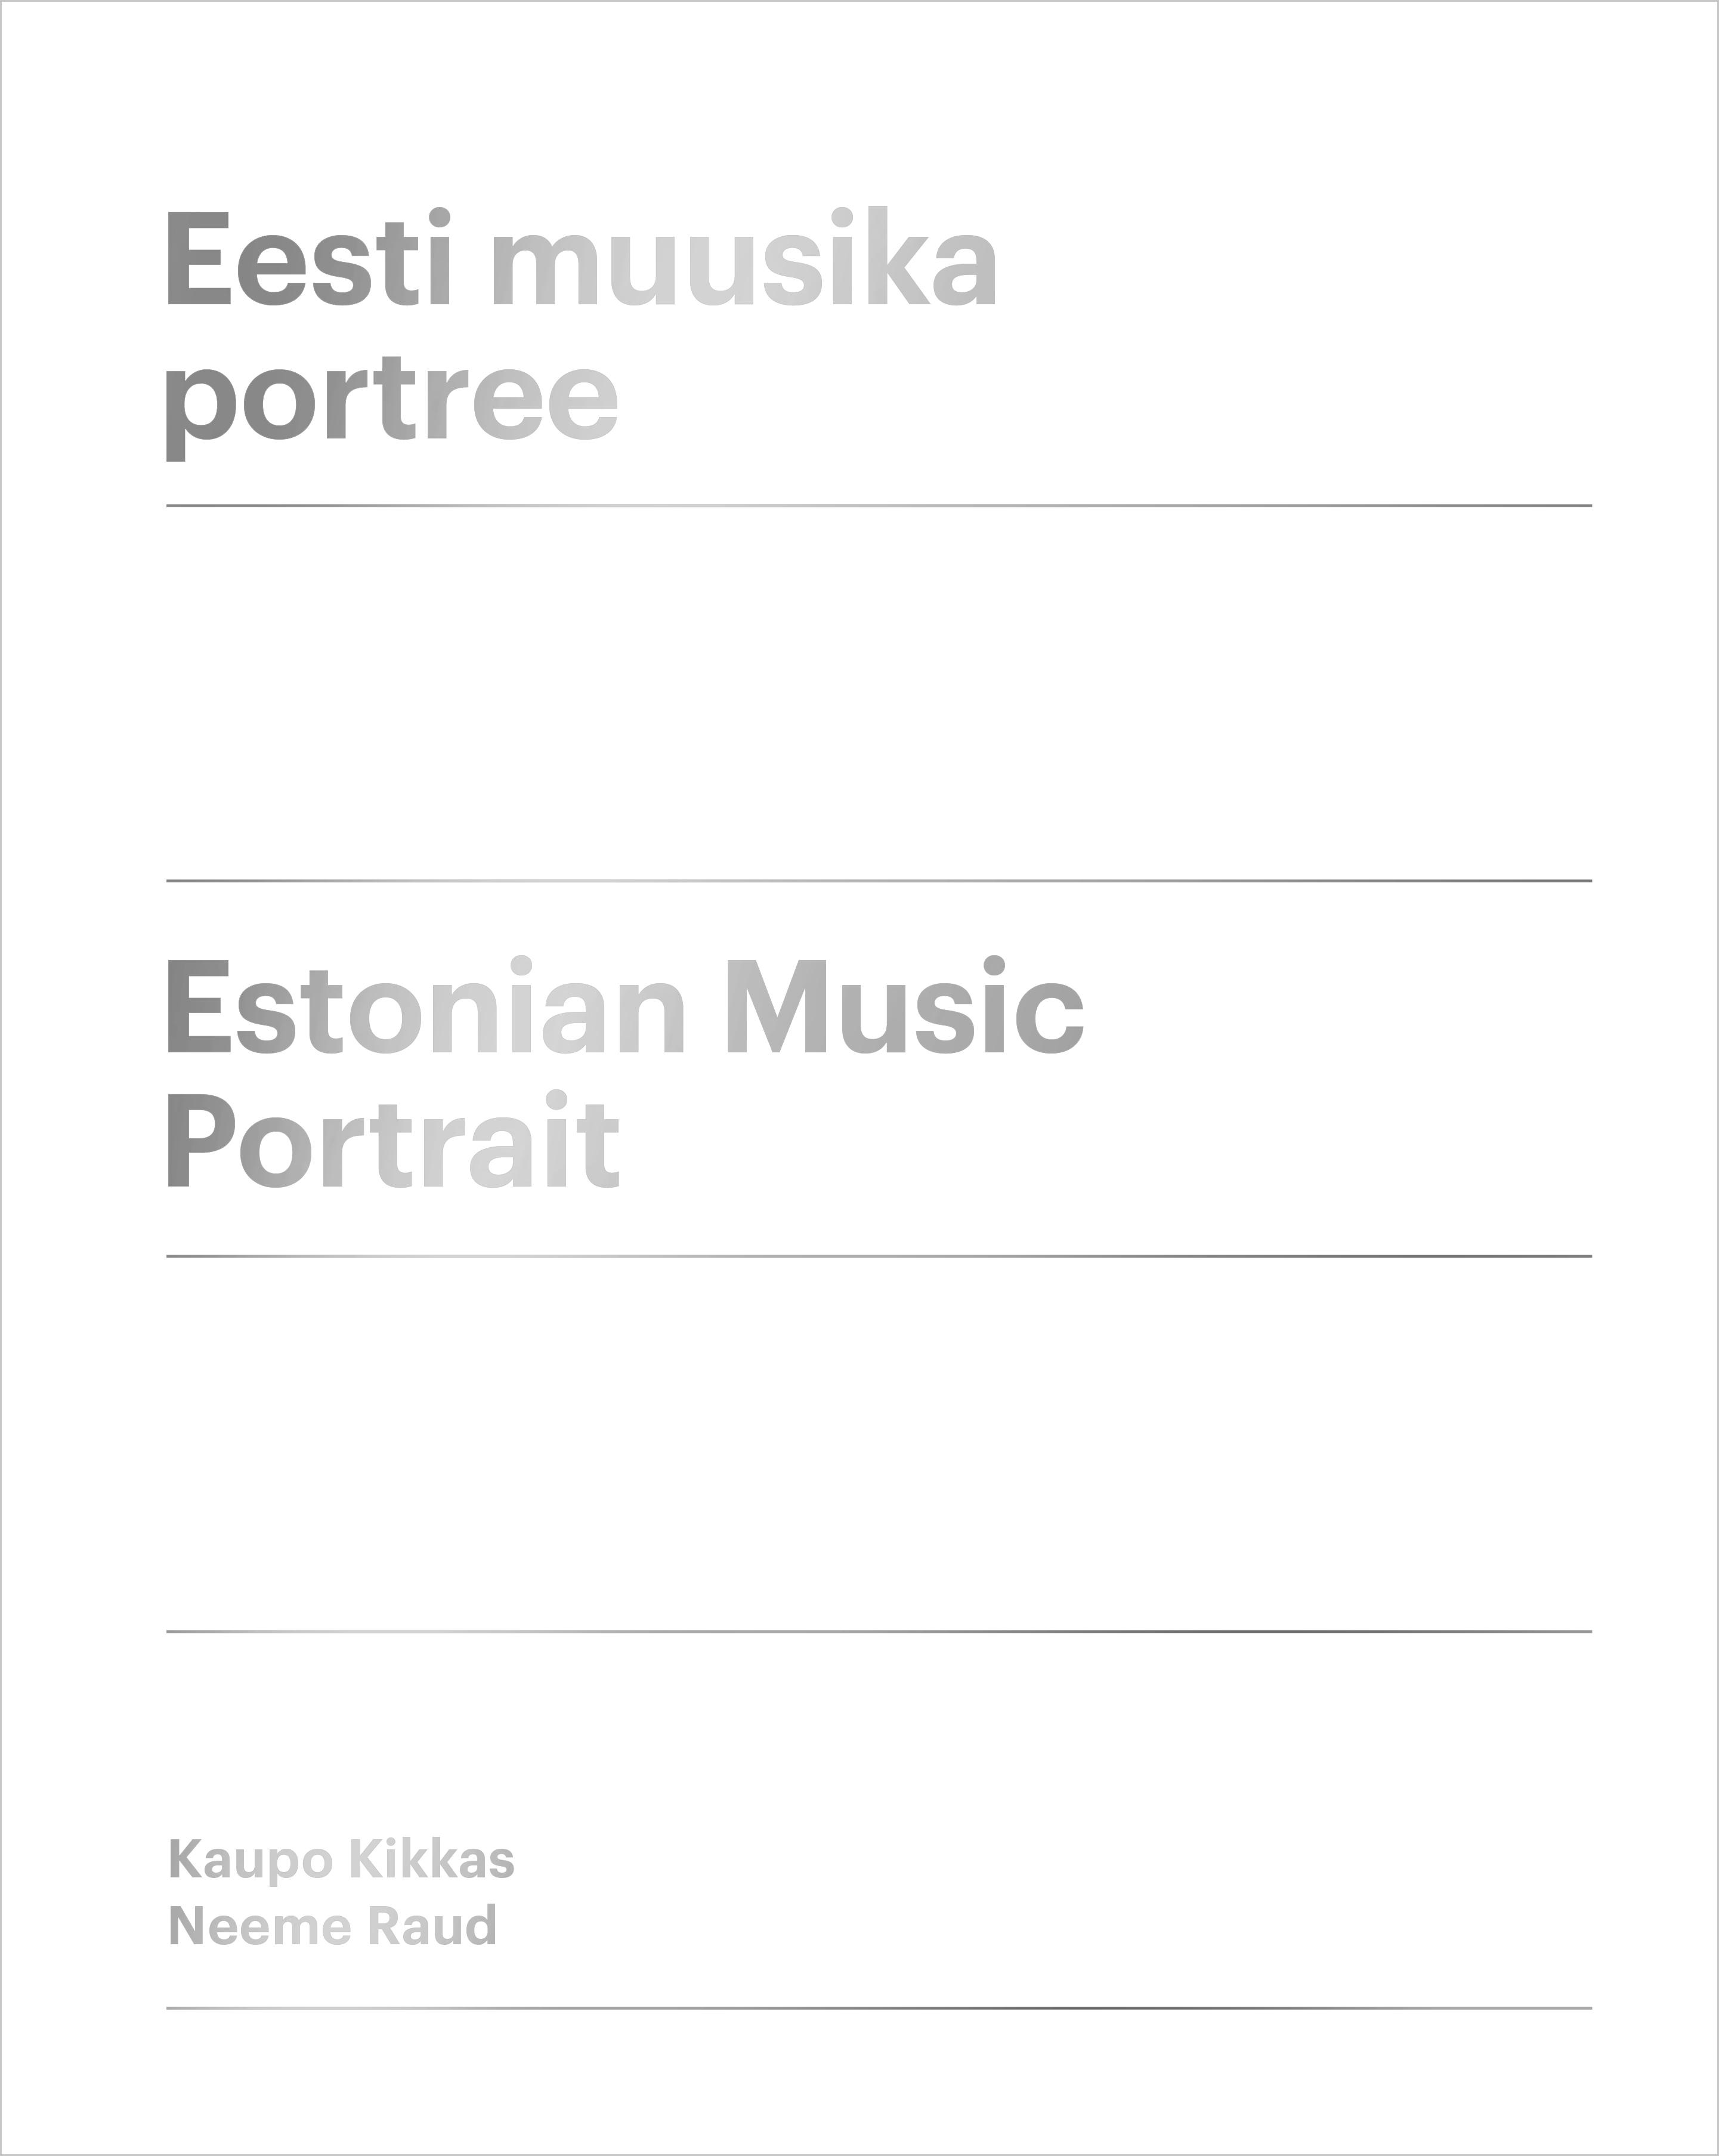 Eesti muusika portree. estonian music portrait